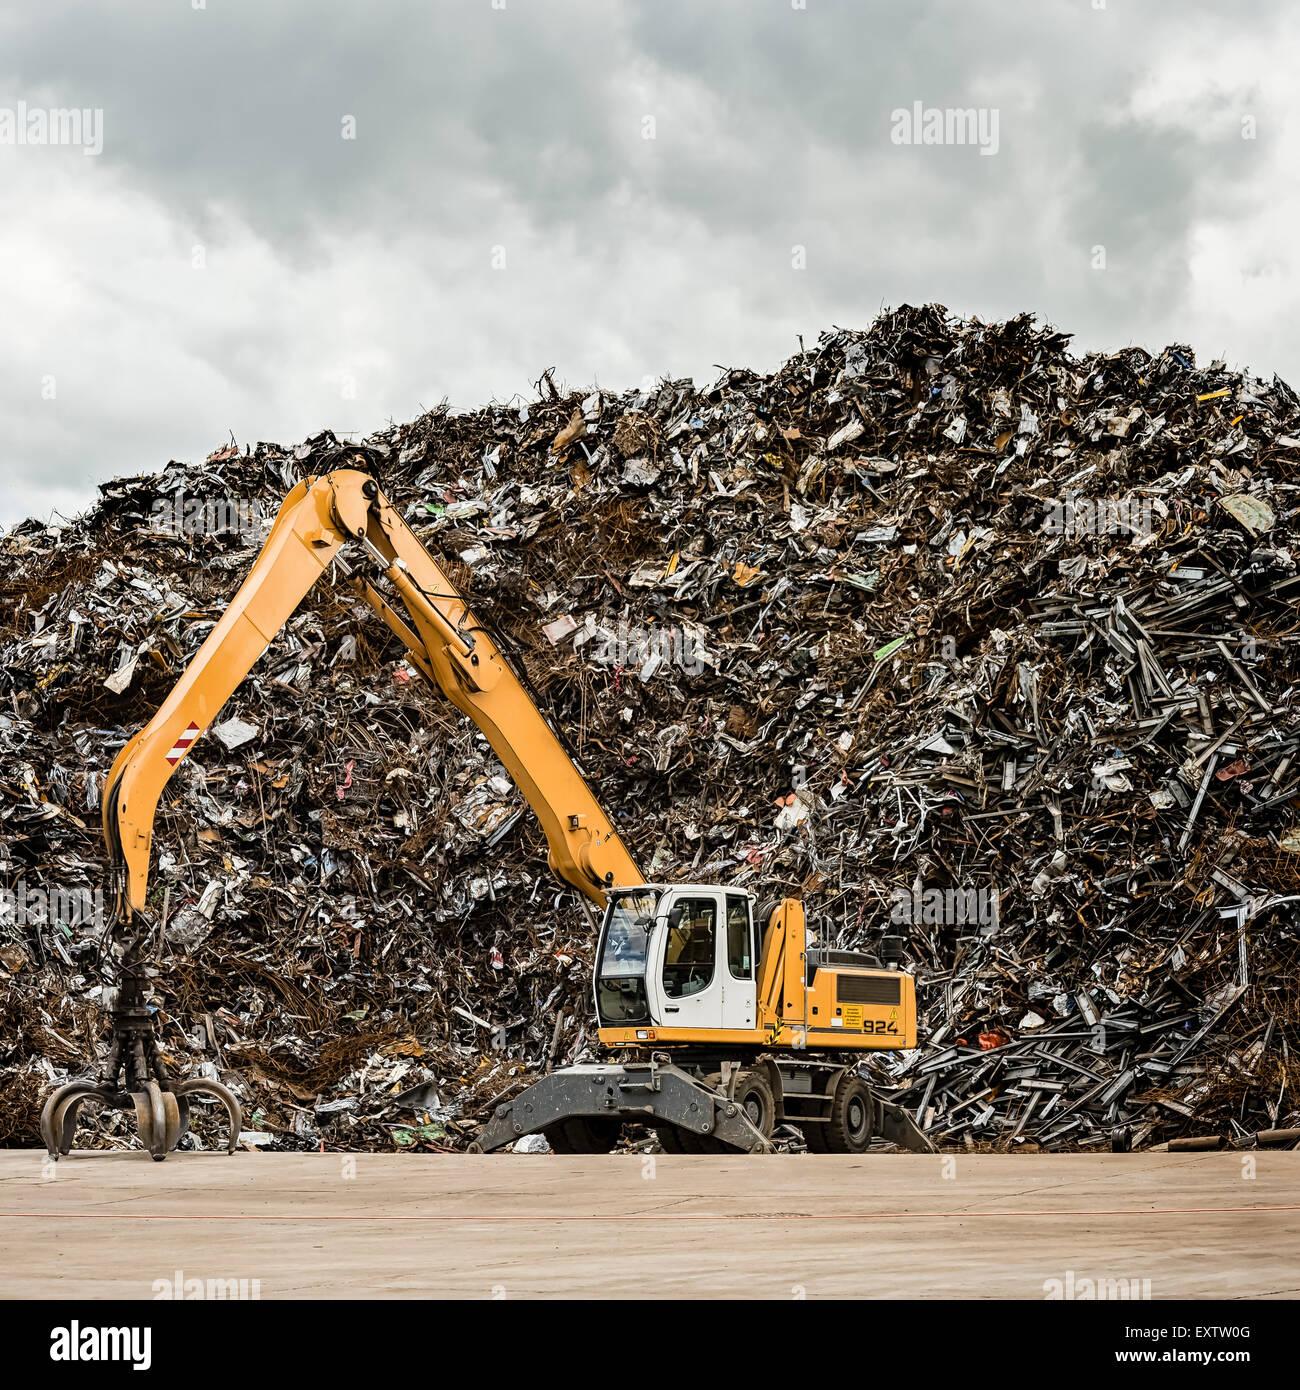 Recycling yard in Hamburg, Germany, scrap metal - Stock Image